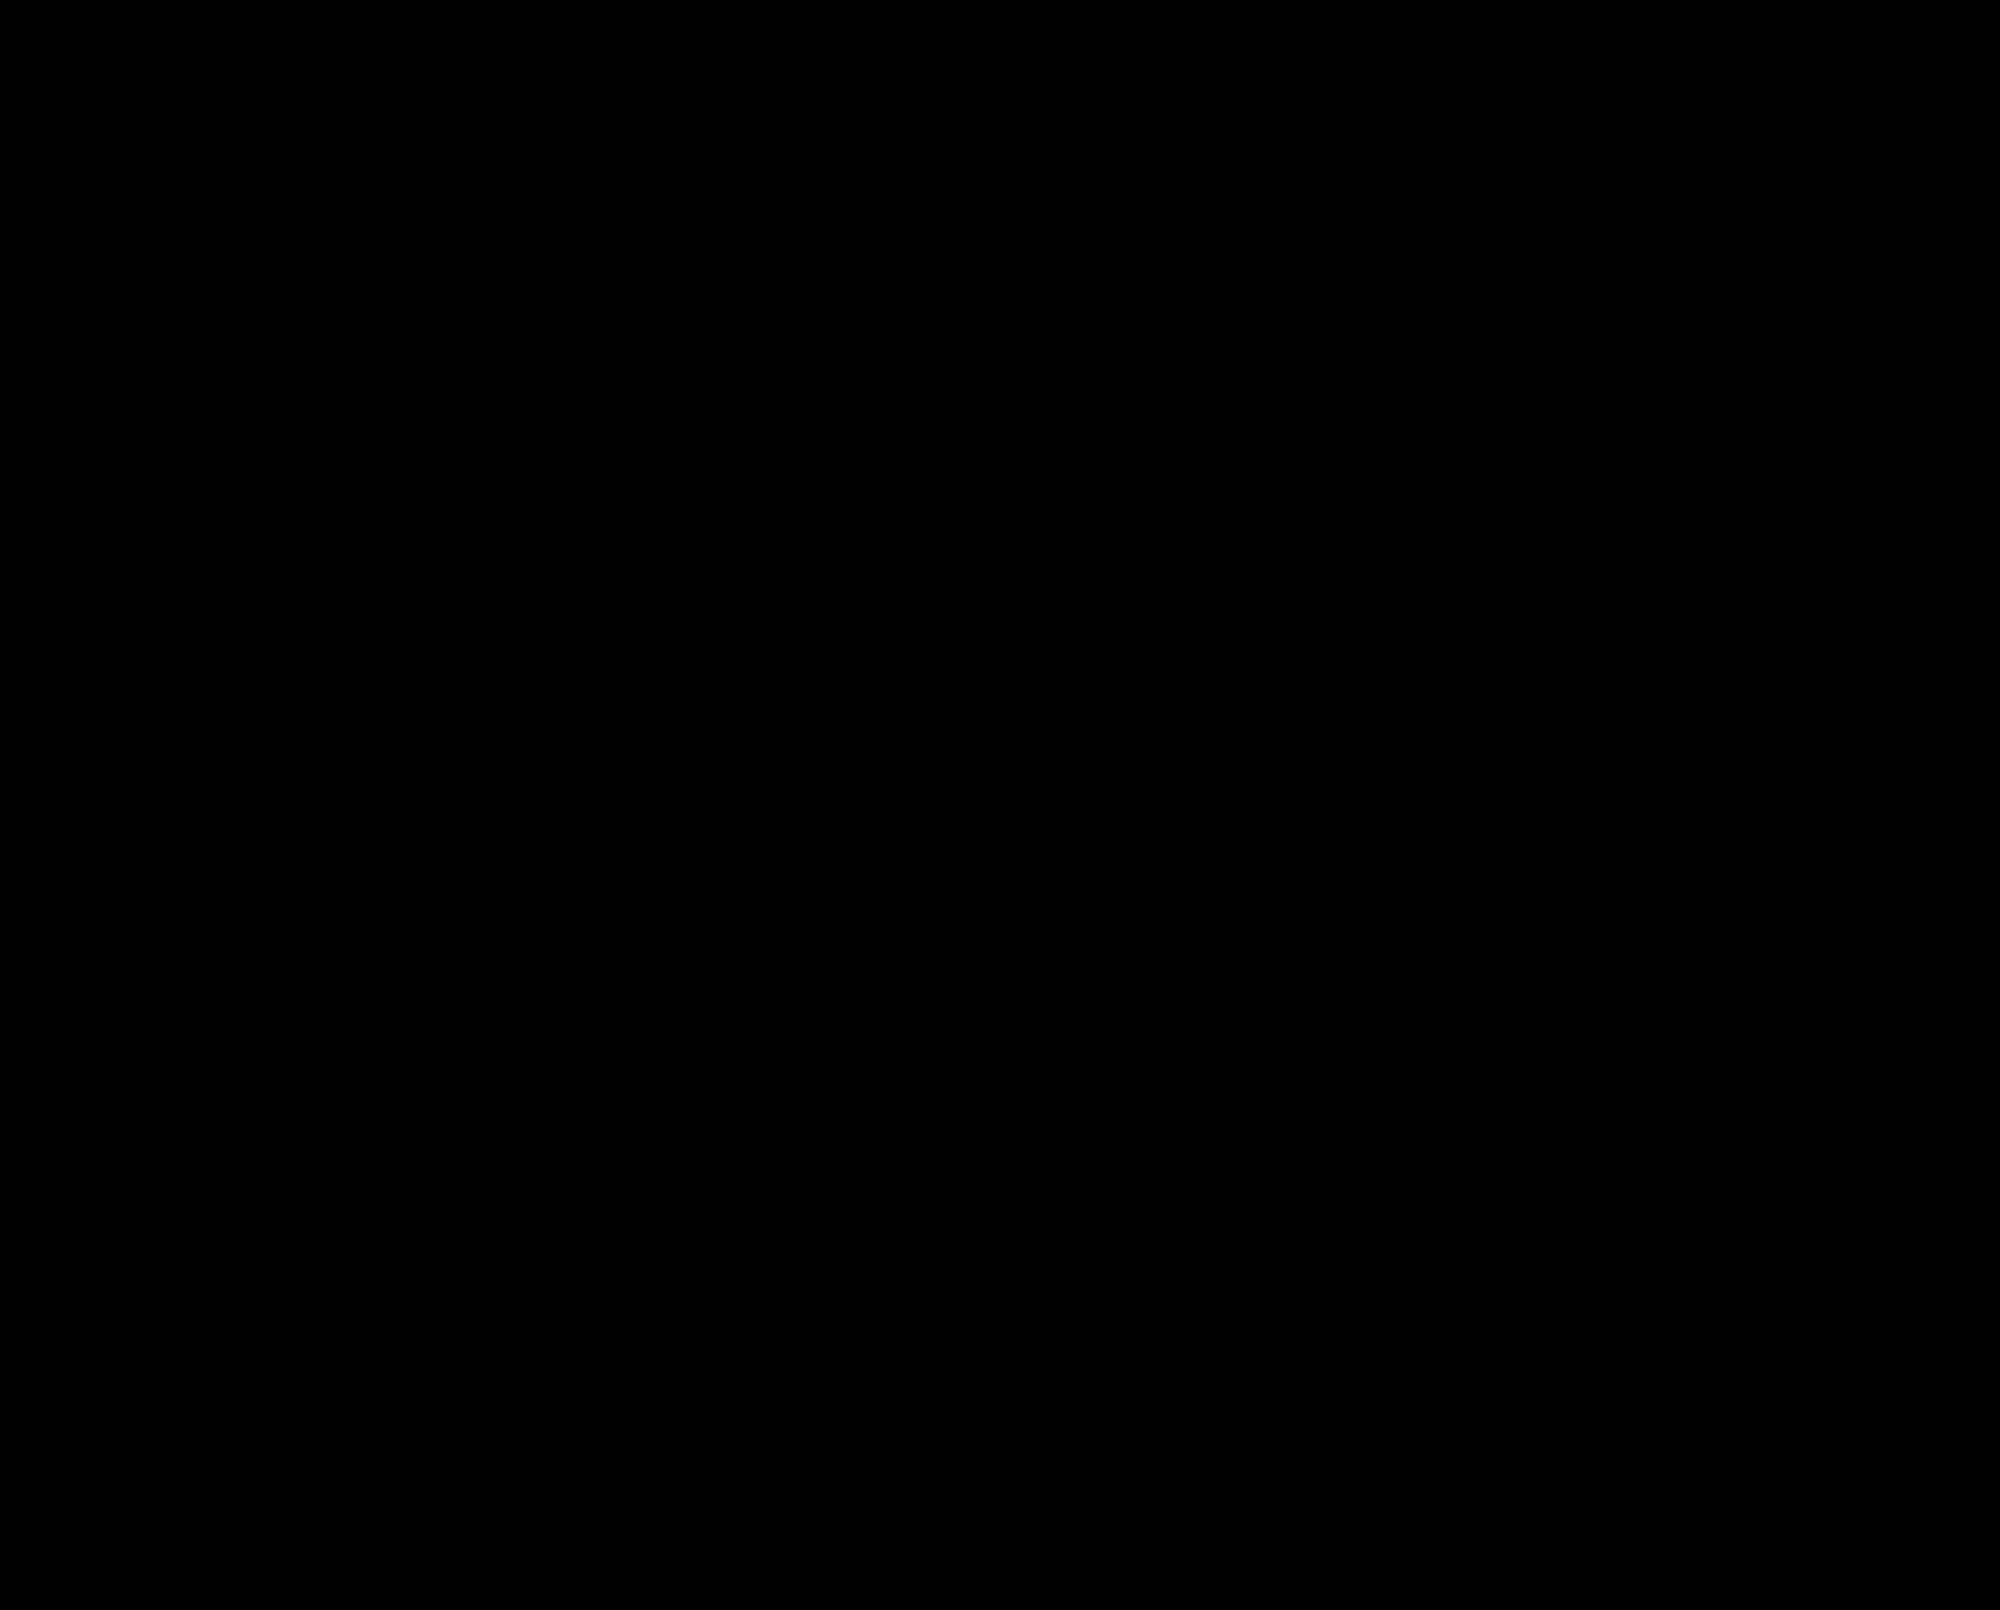 ukiyo conference-logo-black.png